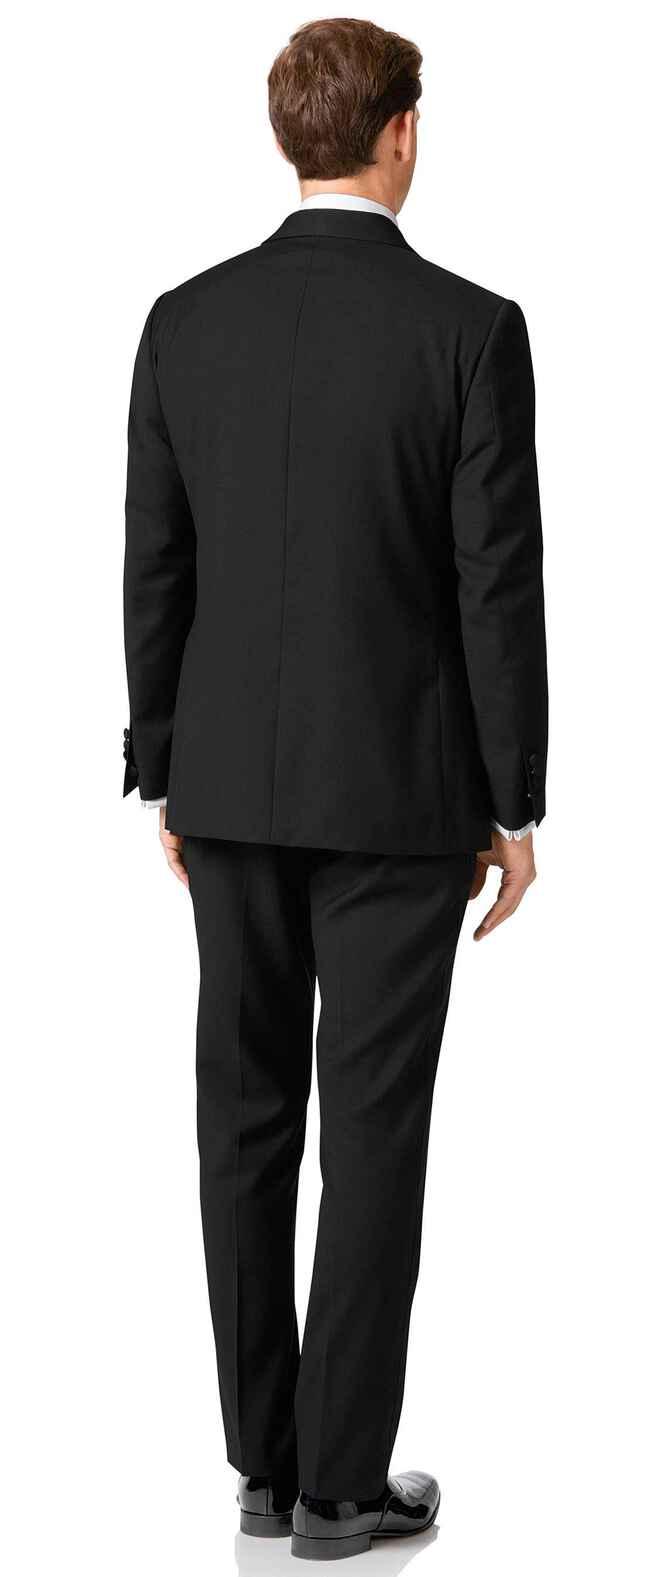 Black classic fit shawl collar tuxedo